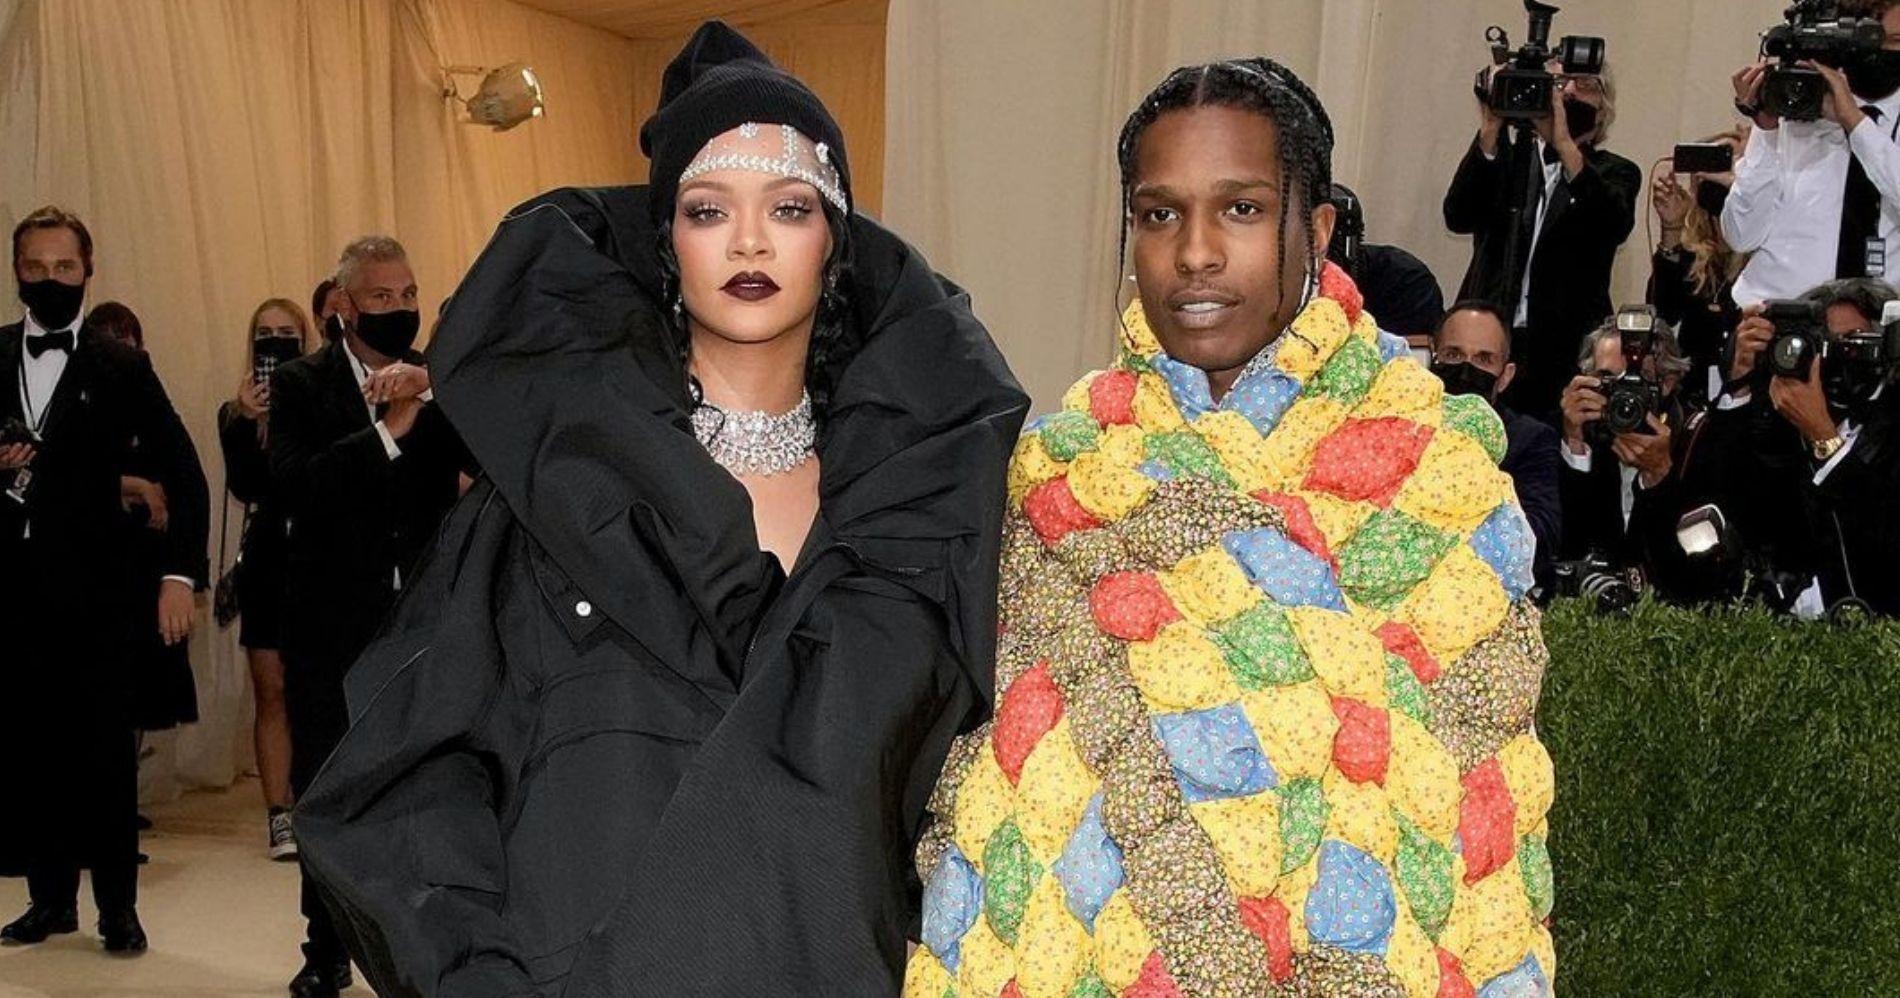 Vogueparis - Asap Rocky dan sang pacar Rihanna